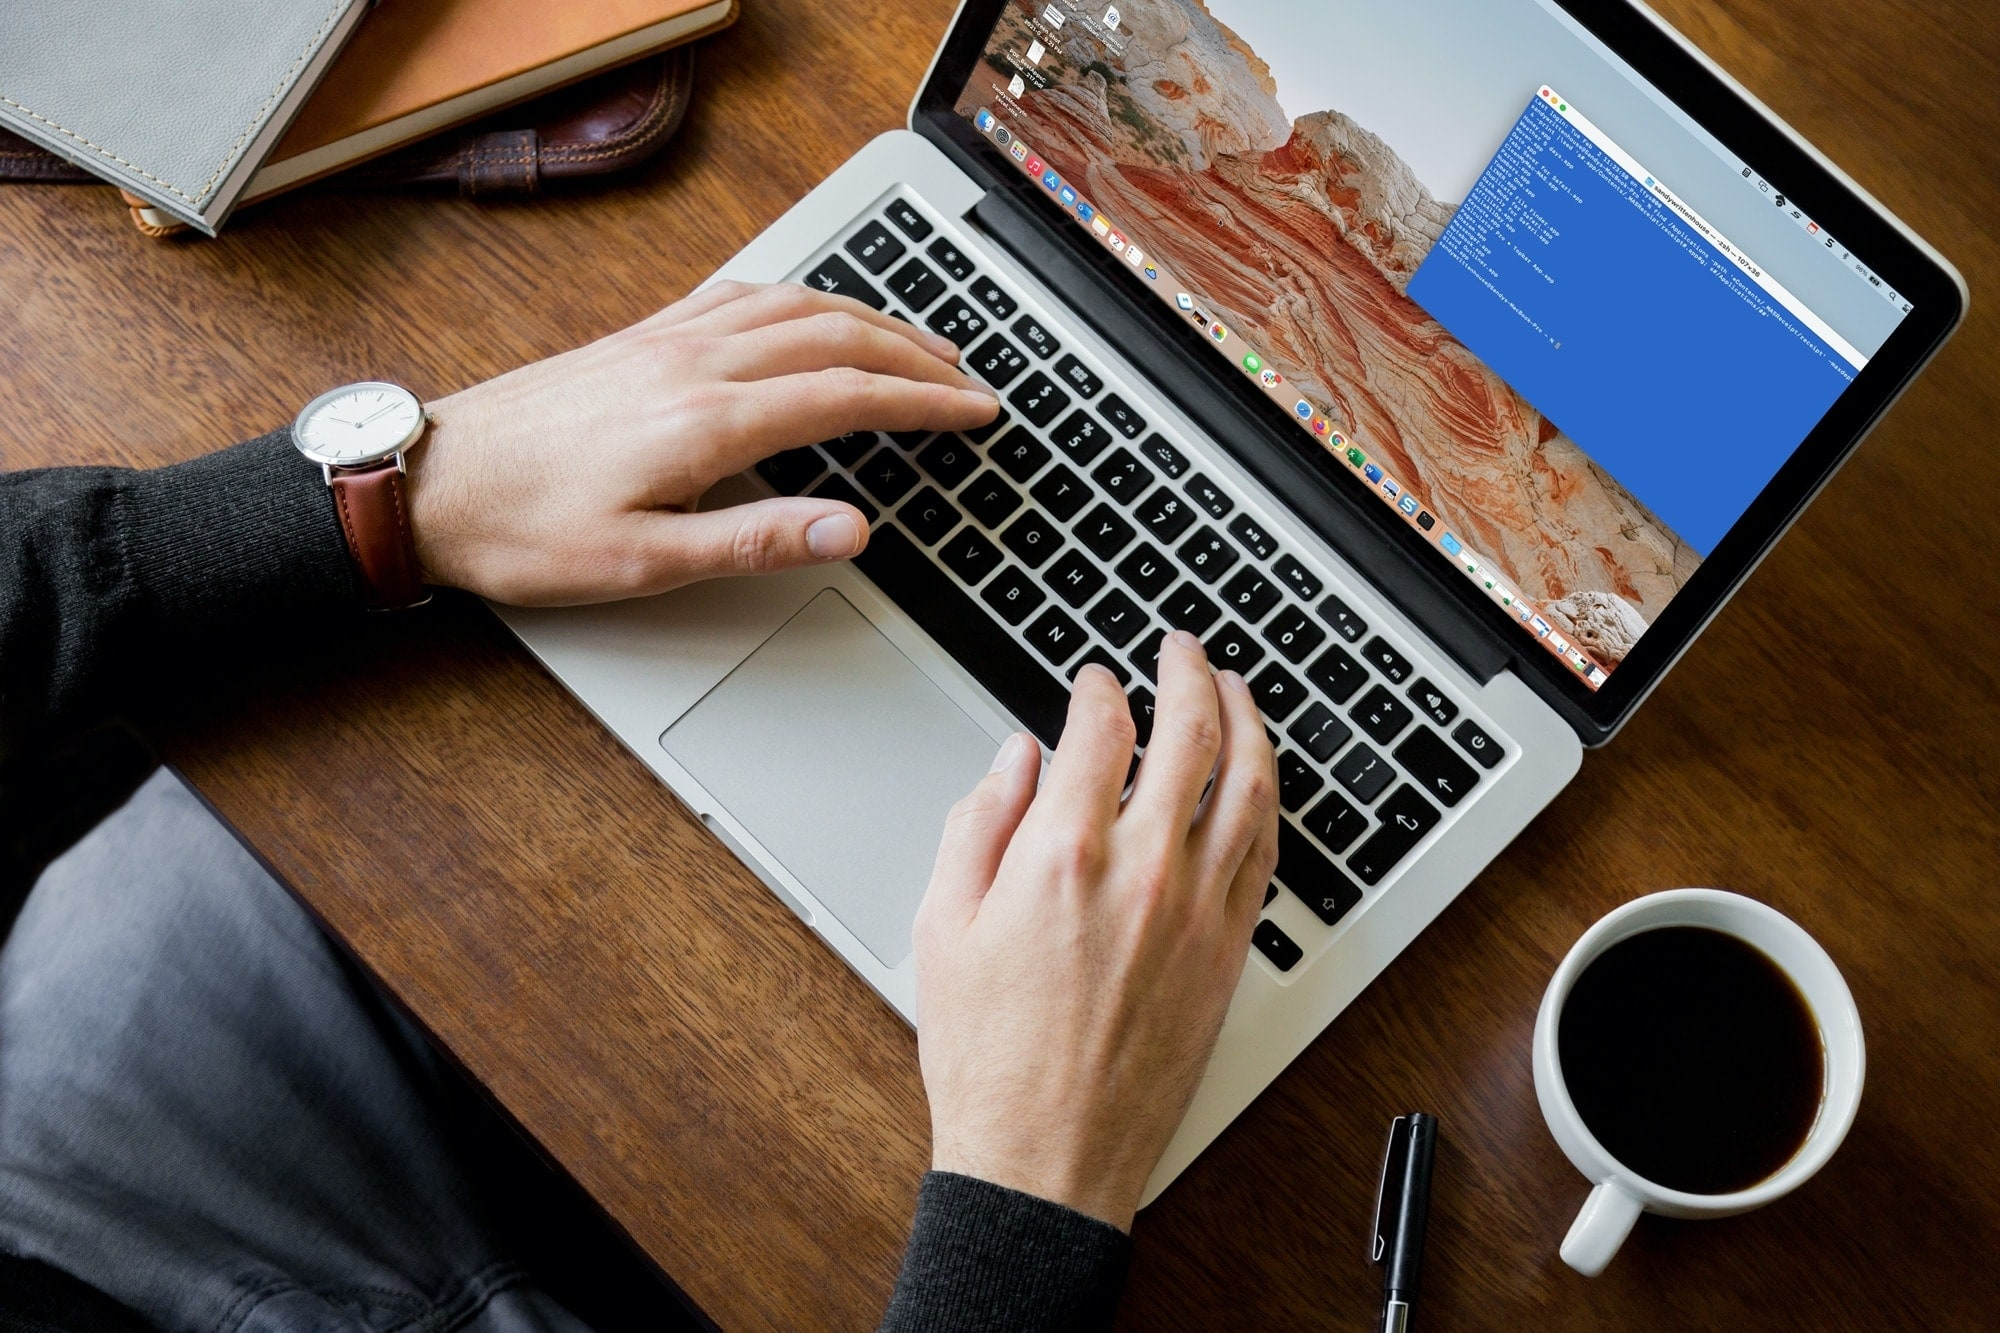 Terminal on MacBook Pro Screen